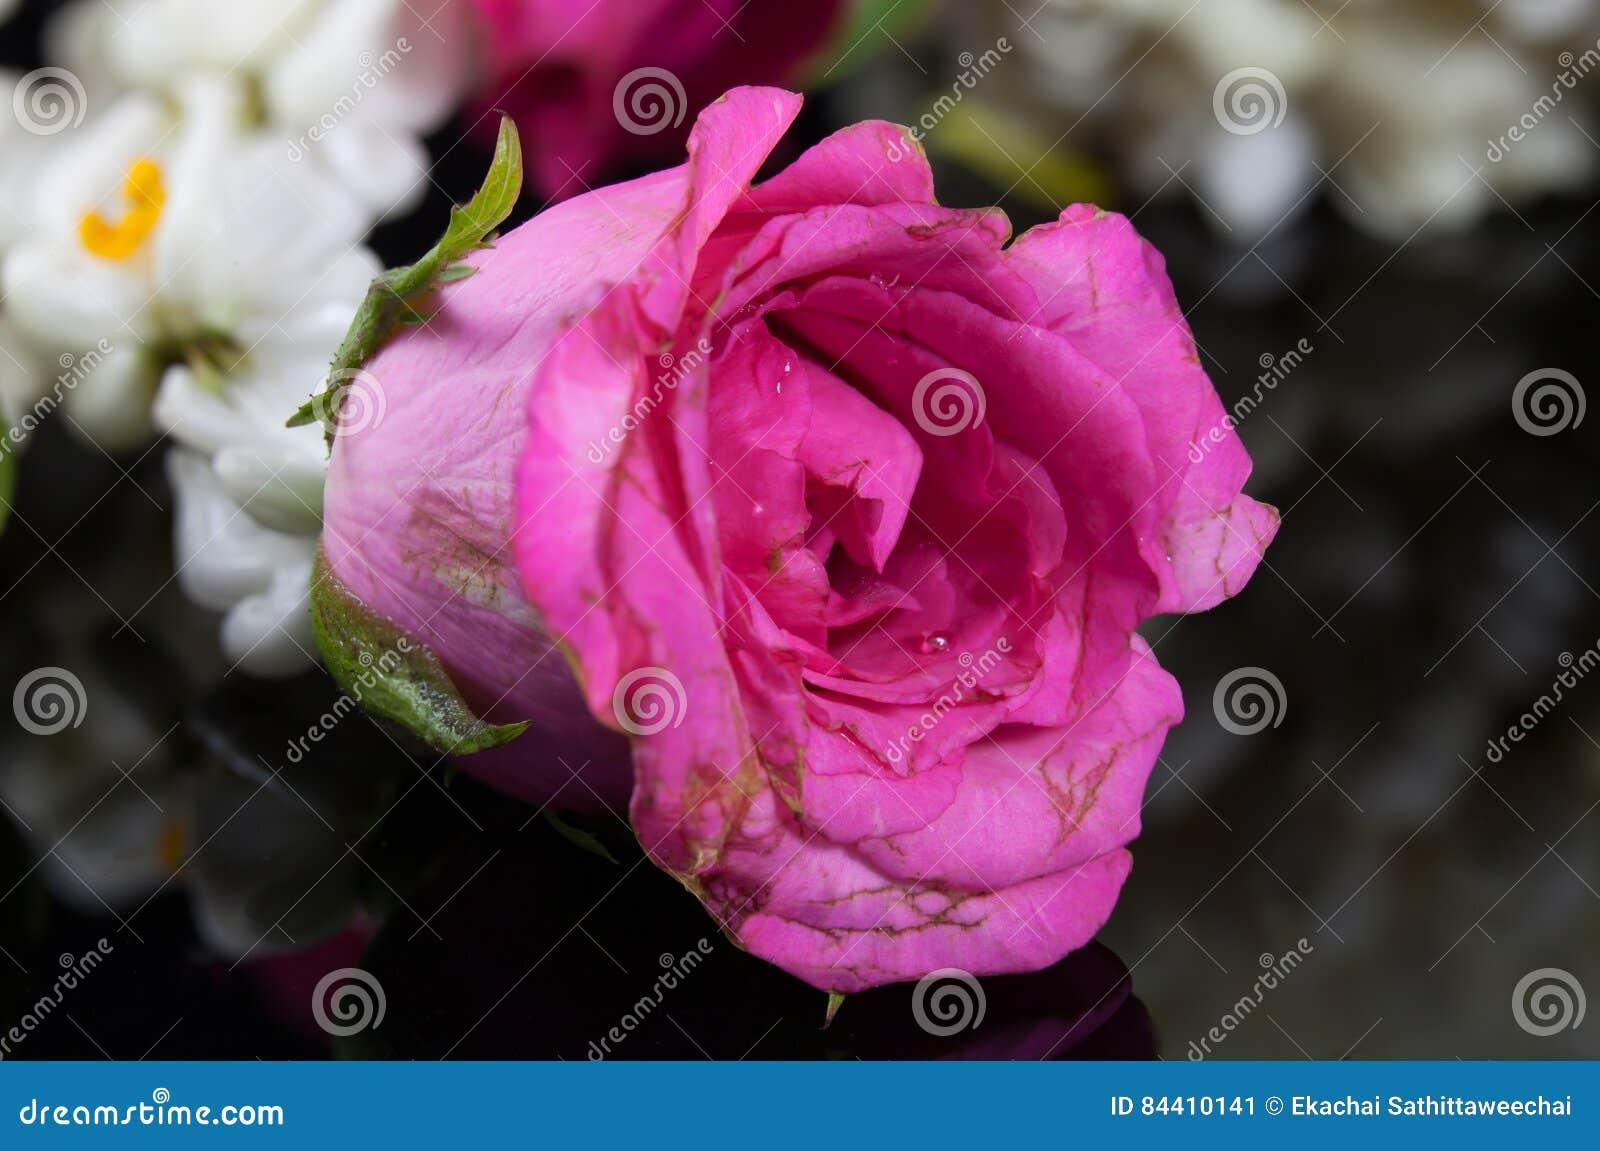 Beautiful jasmine garland of flowers with pink rose stock photo beautiful jasmine garland of flowers with pink rose stock image izmirmasajfo